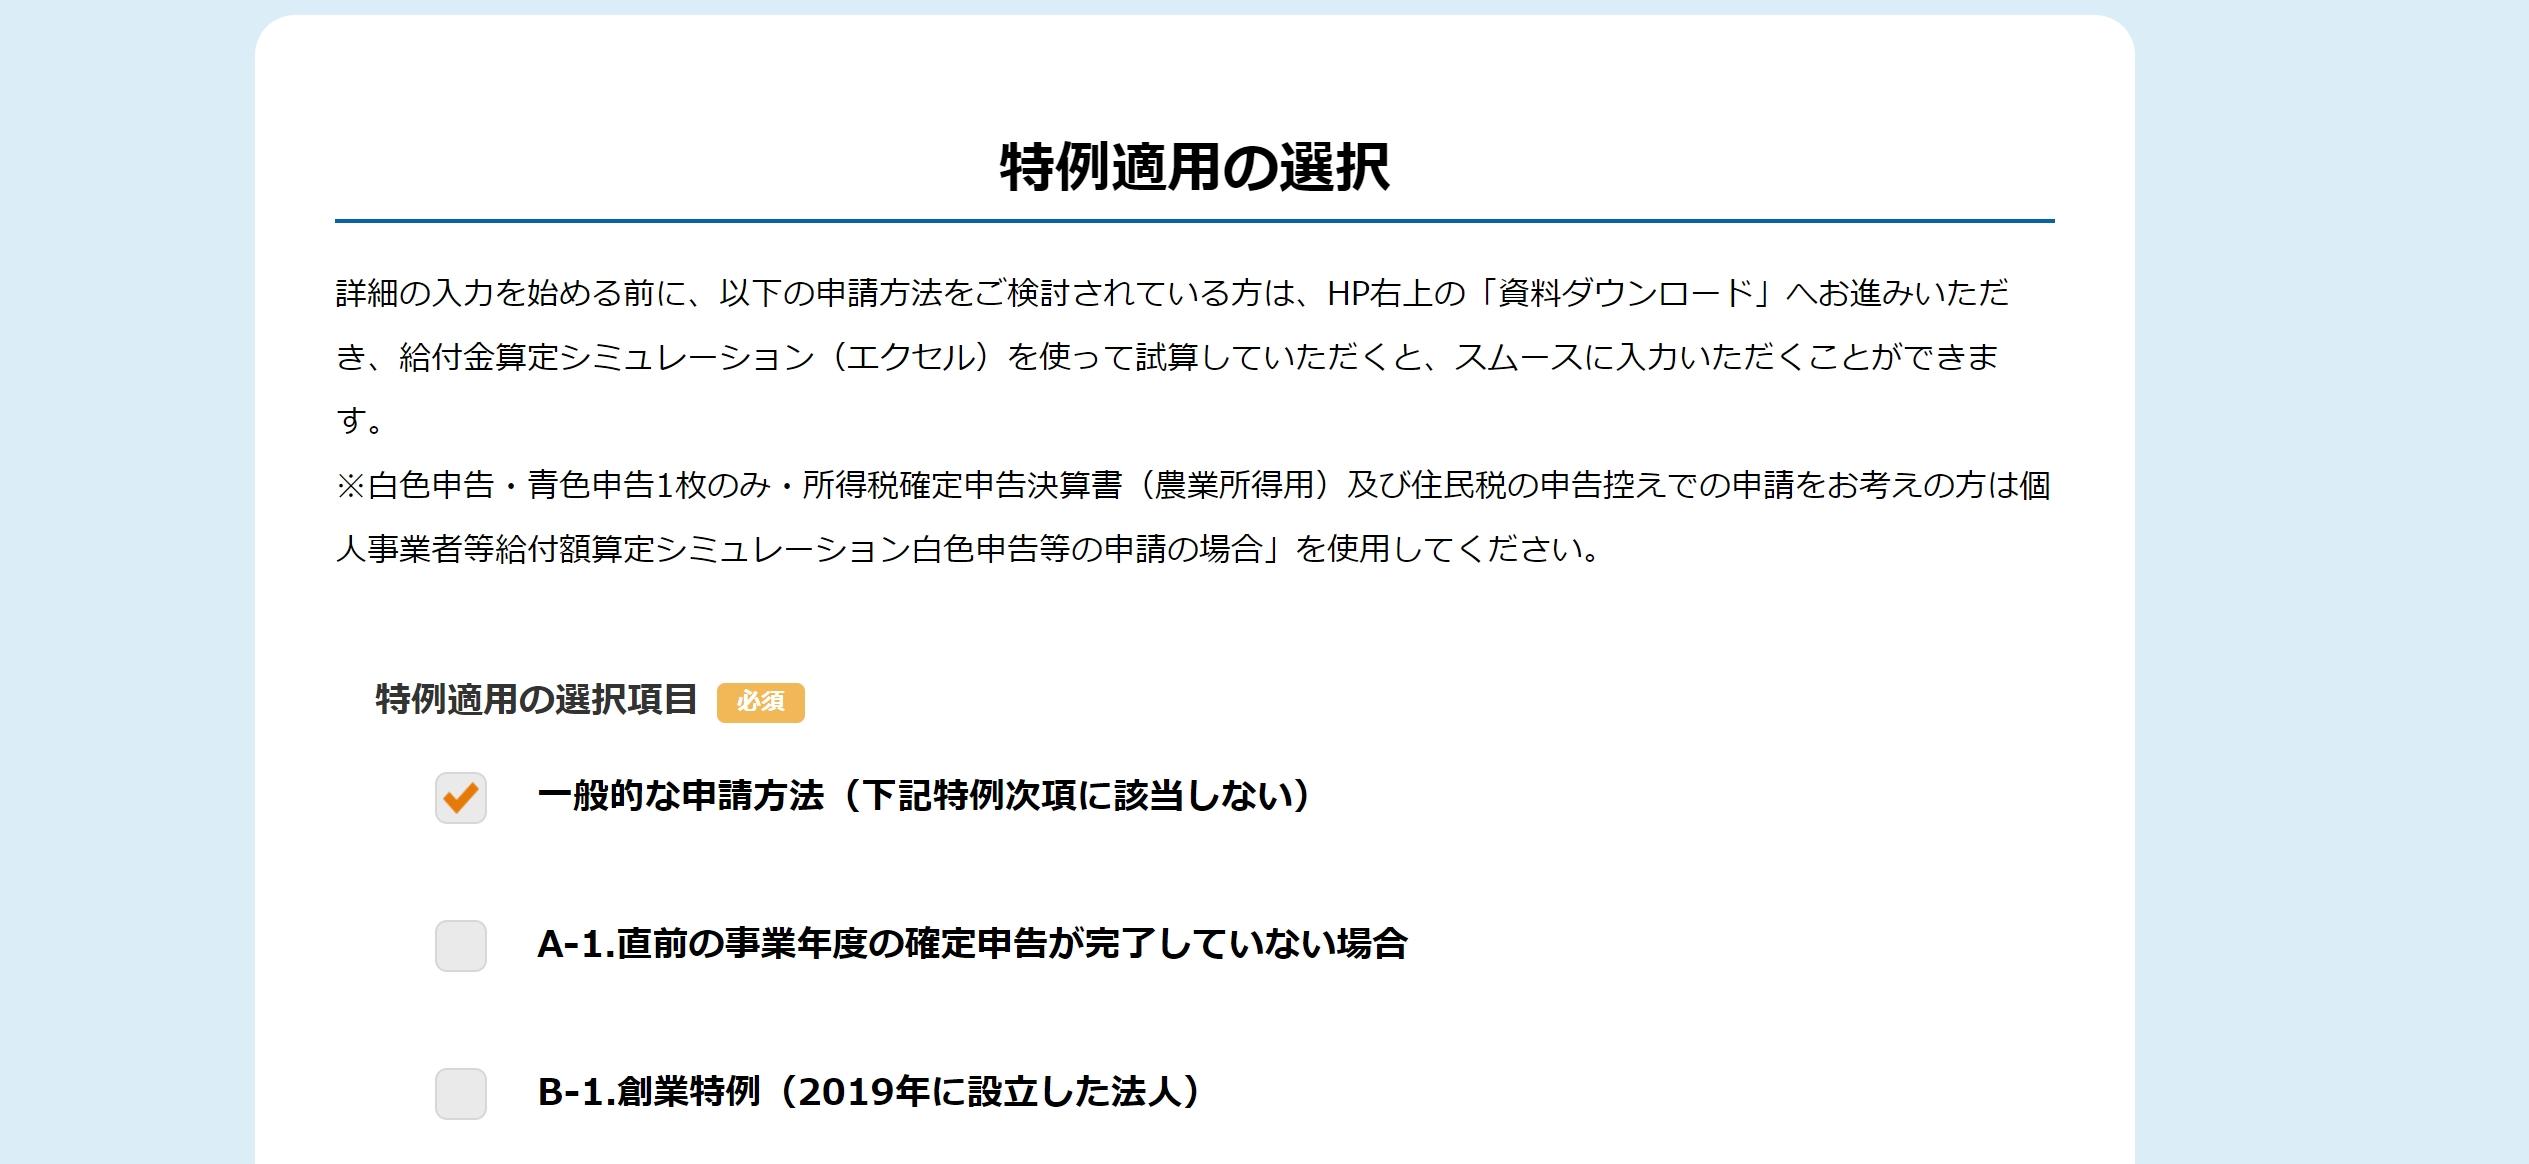 Screenshot 22